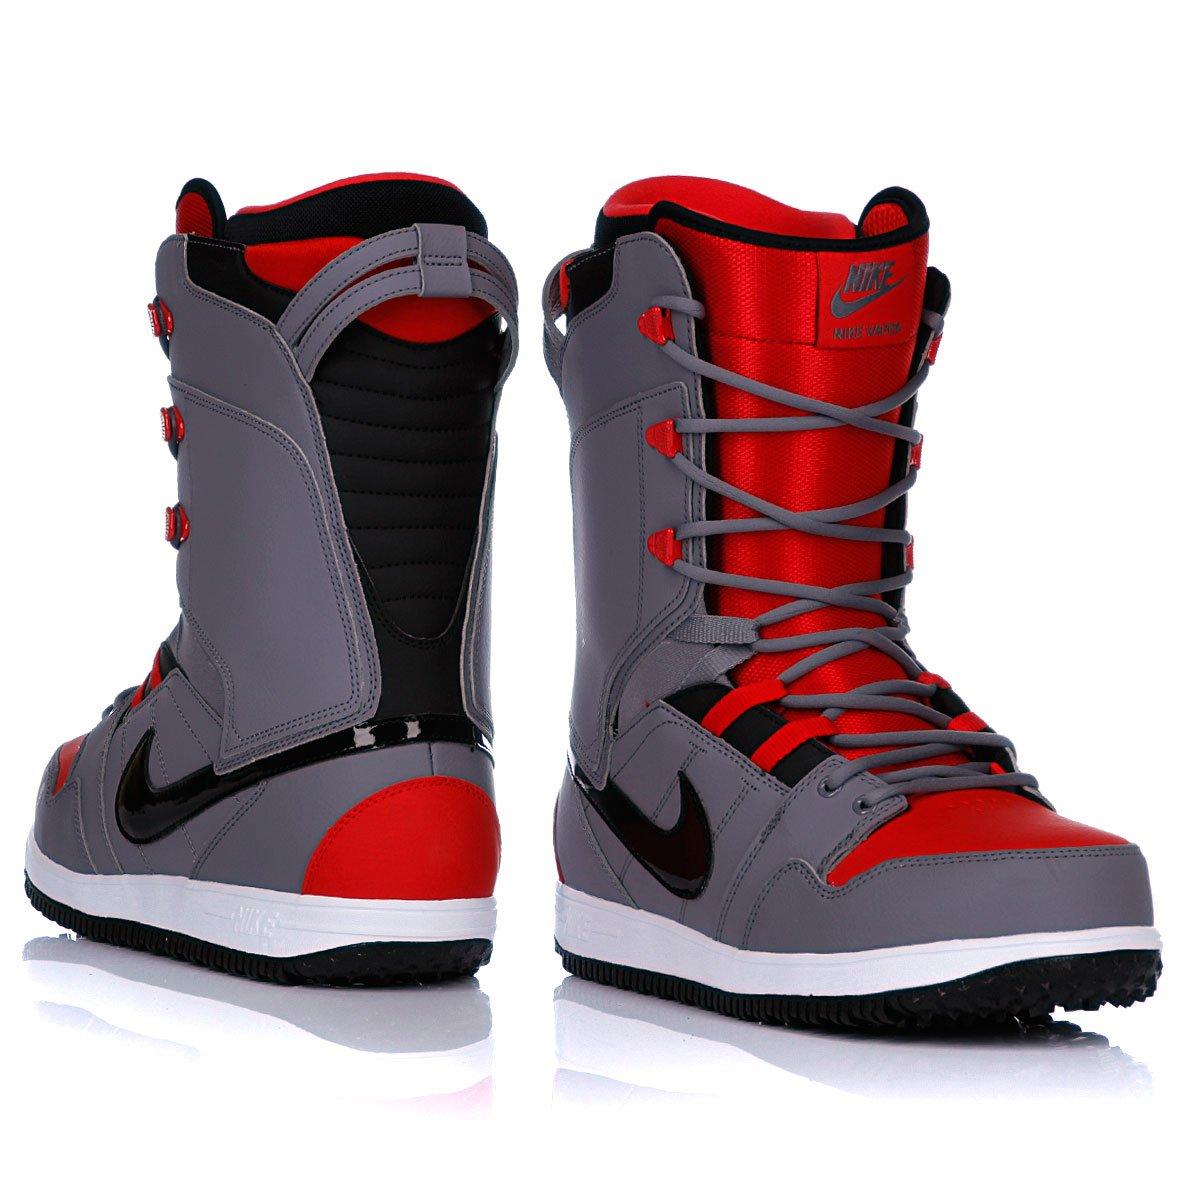 1ab9f536 Купить ботинки для сноуборда Nike Vapen Charcoal/Black (447125-006 ...